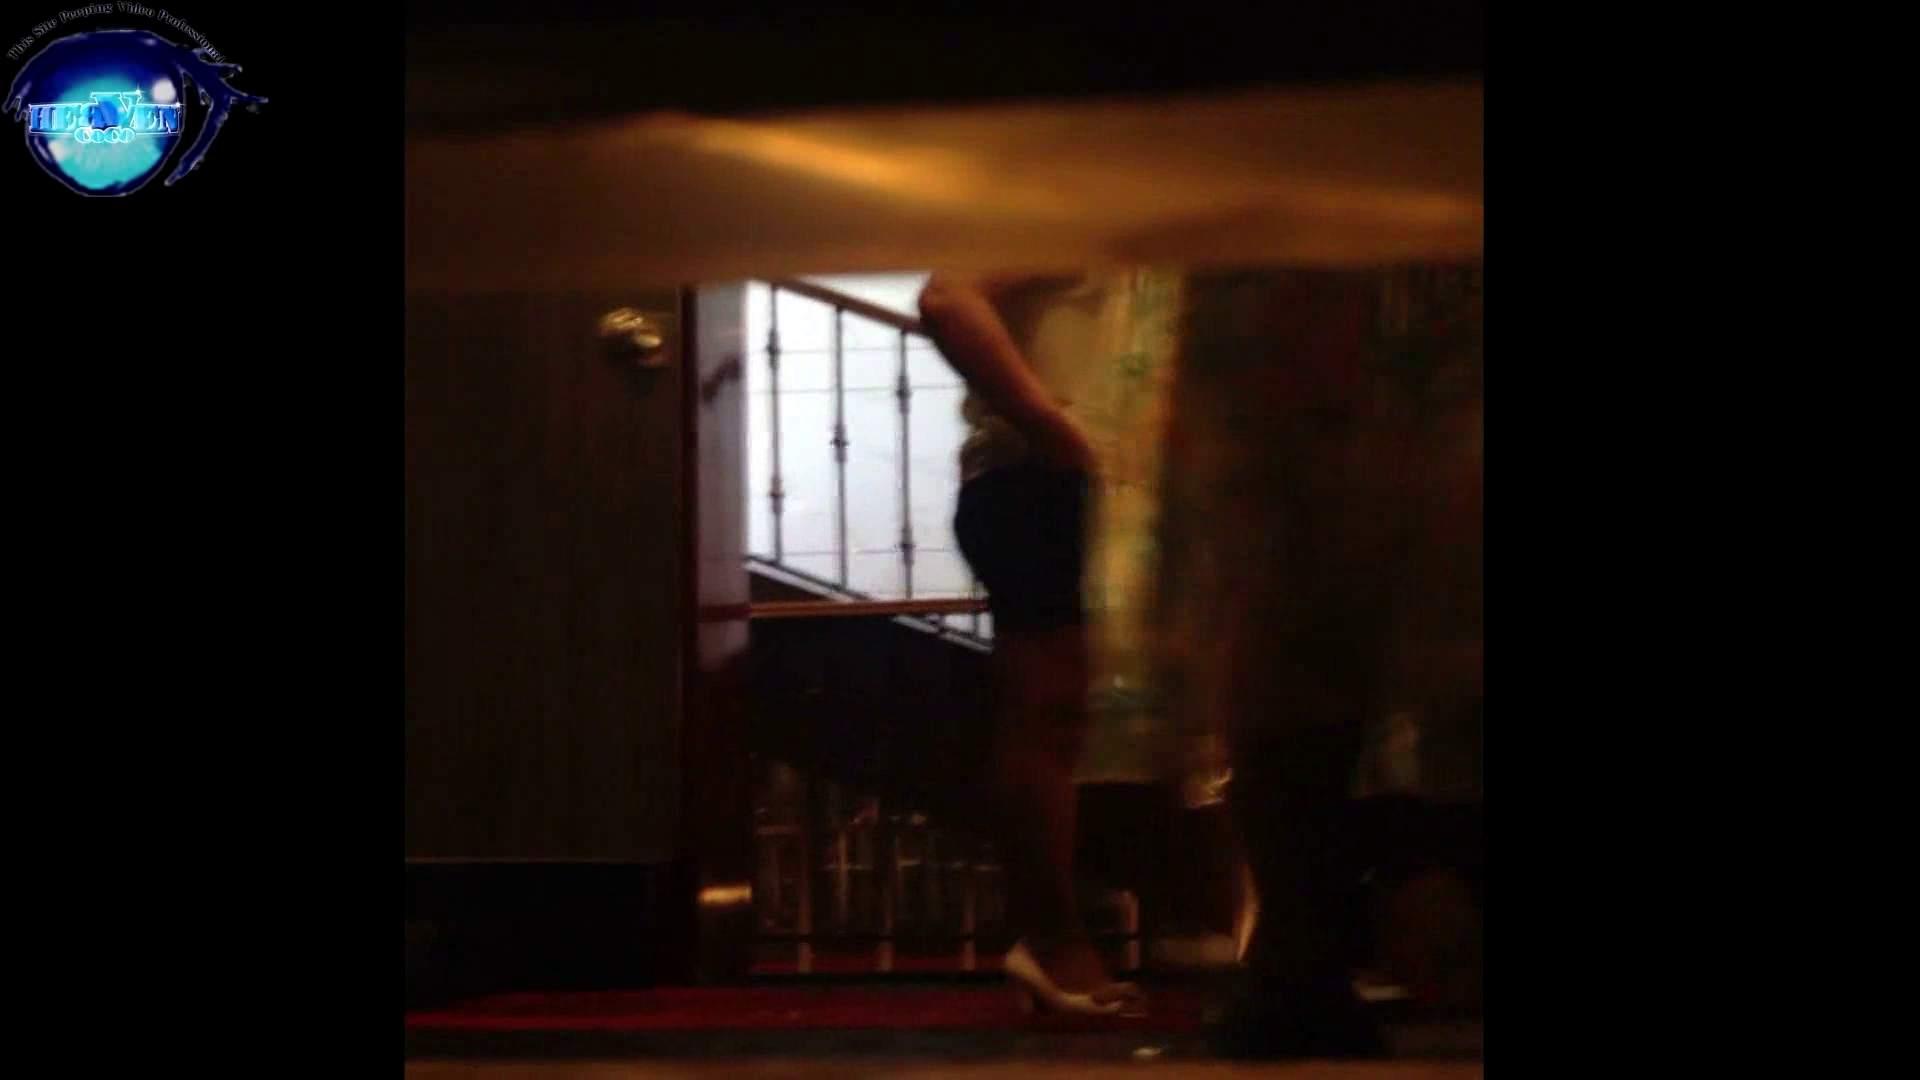 GOD HAND ファッションショッピングセンター盗撮vol.02前編 盗撮 ワレメ無修正動画無料 74連発 2